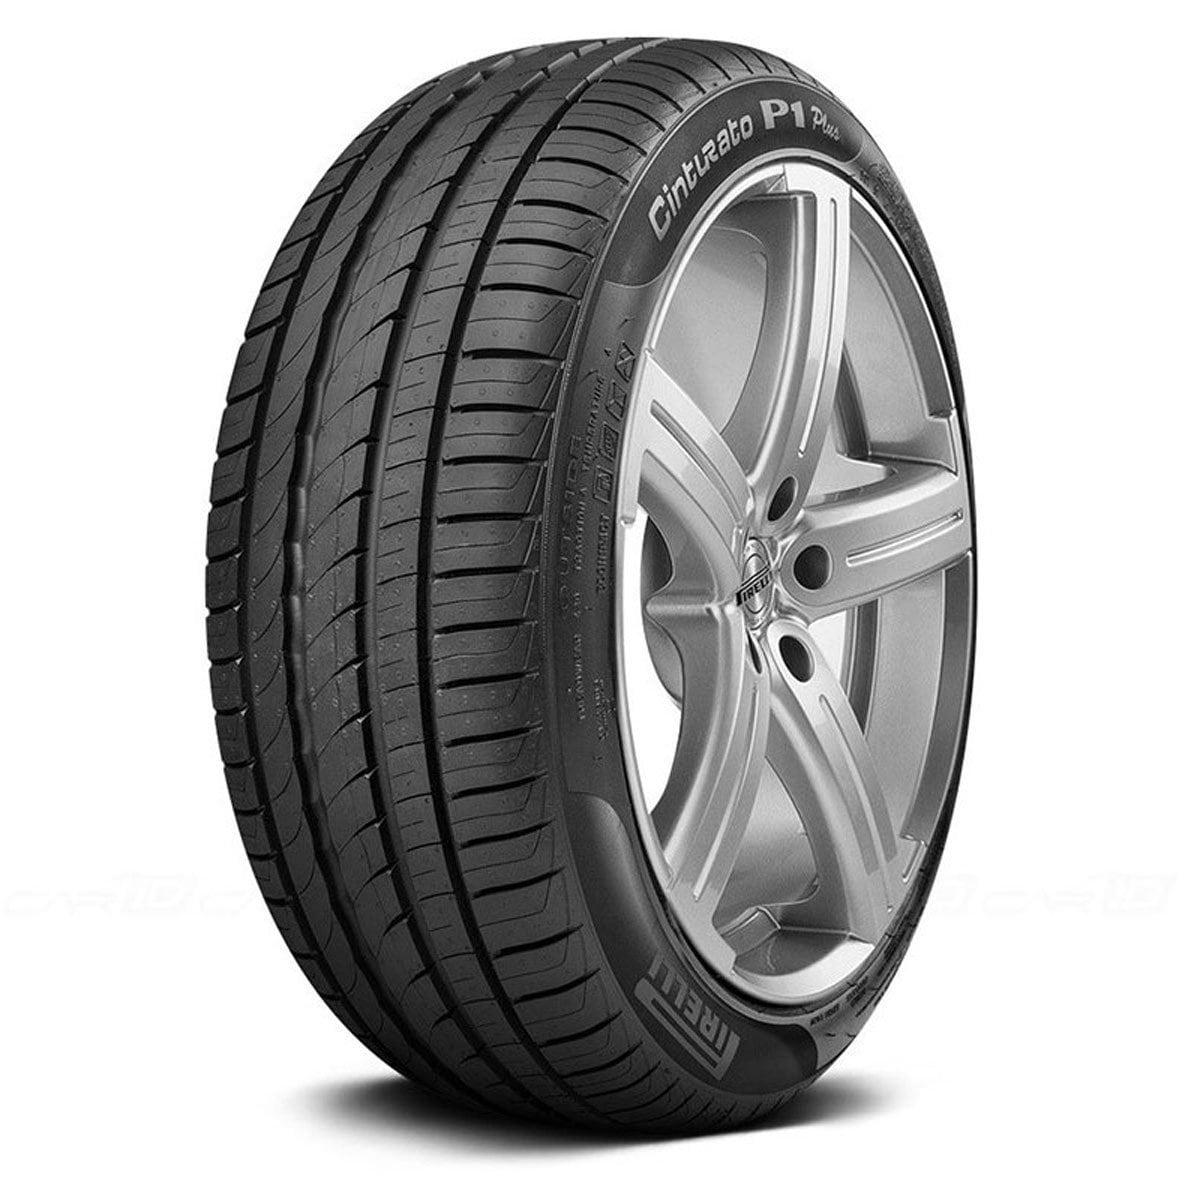 Llanta 195 65 R15 P1 Cint 91H Pirelli